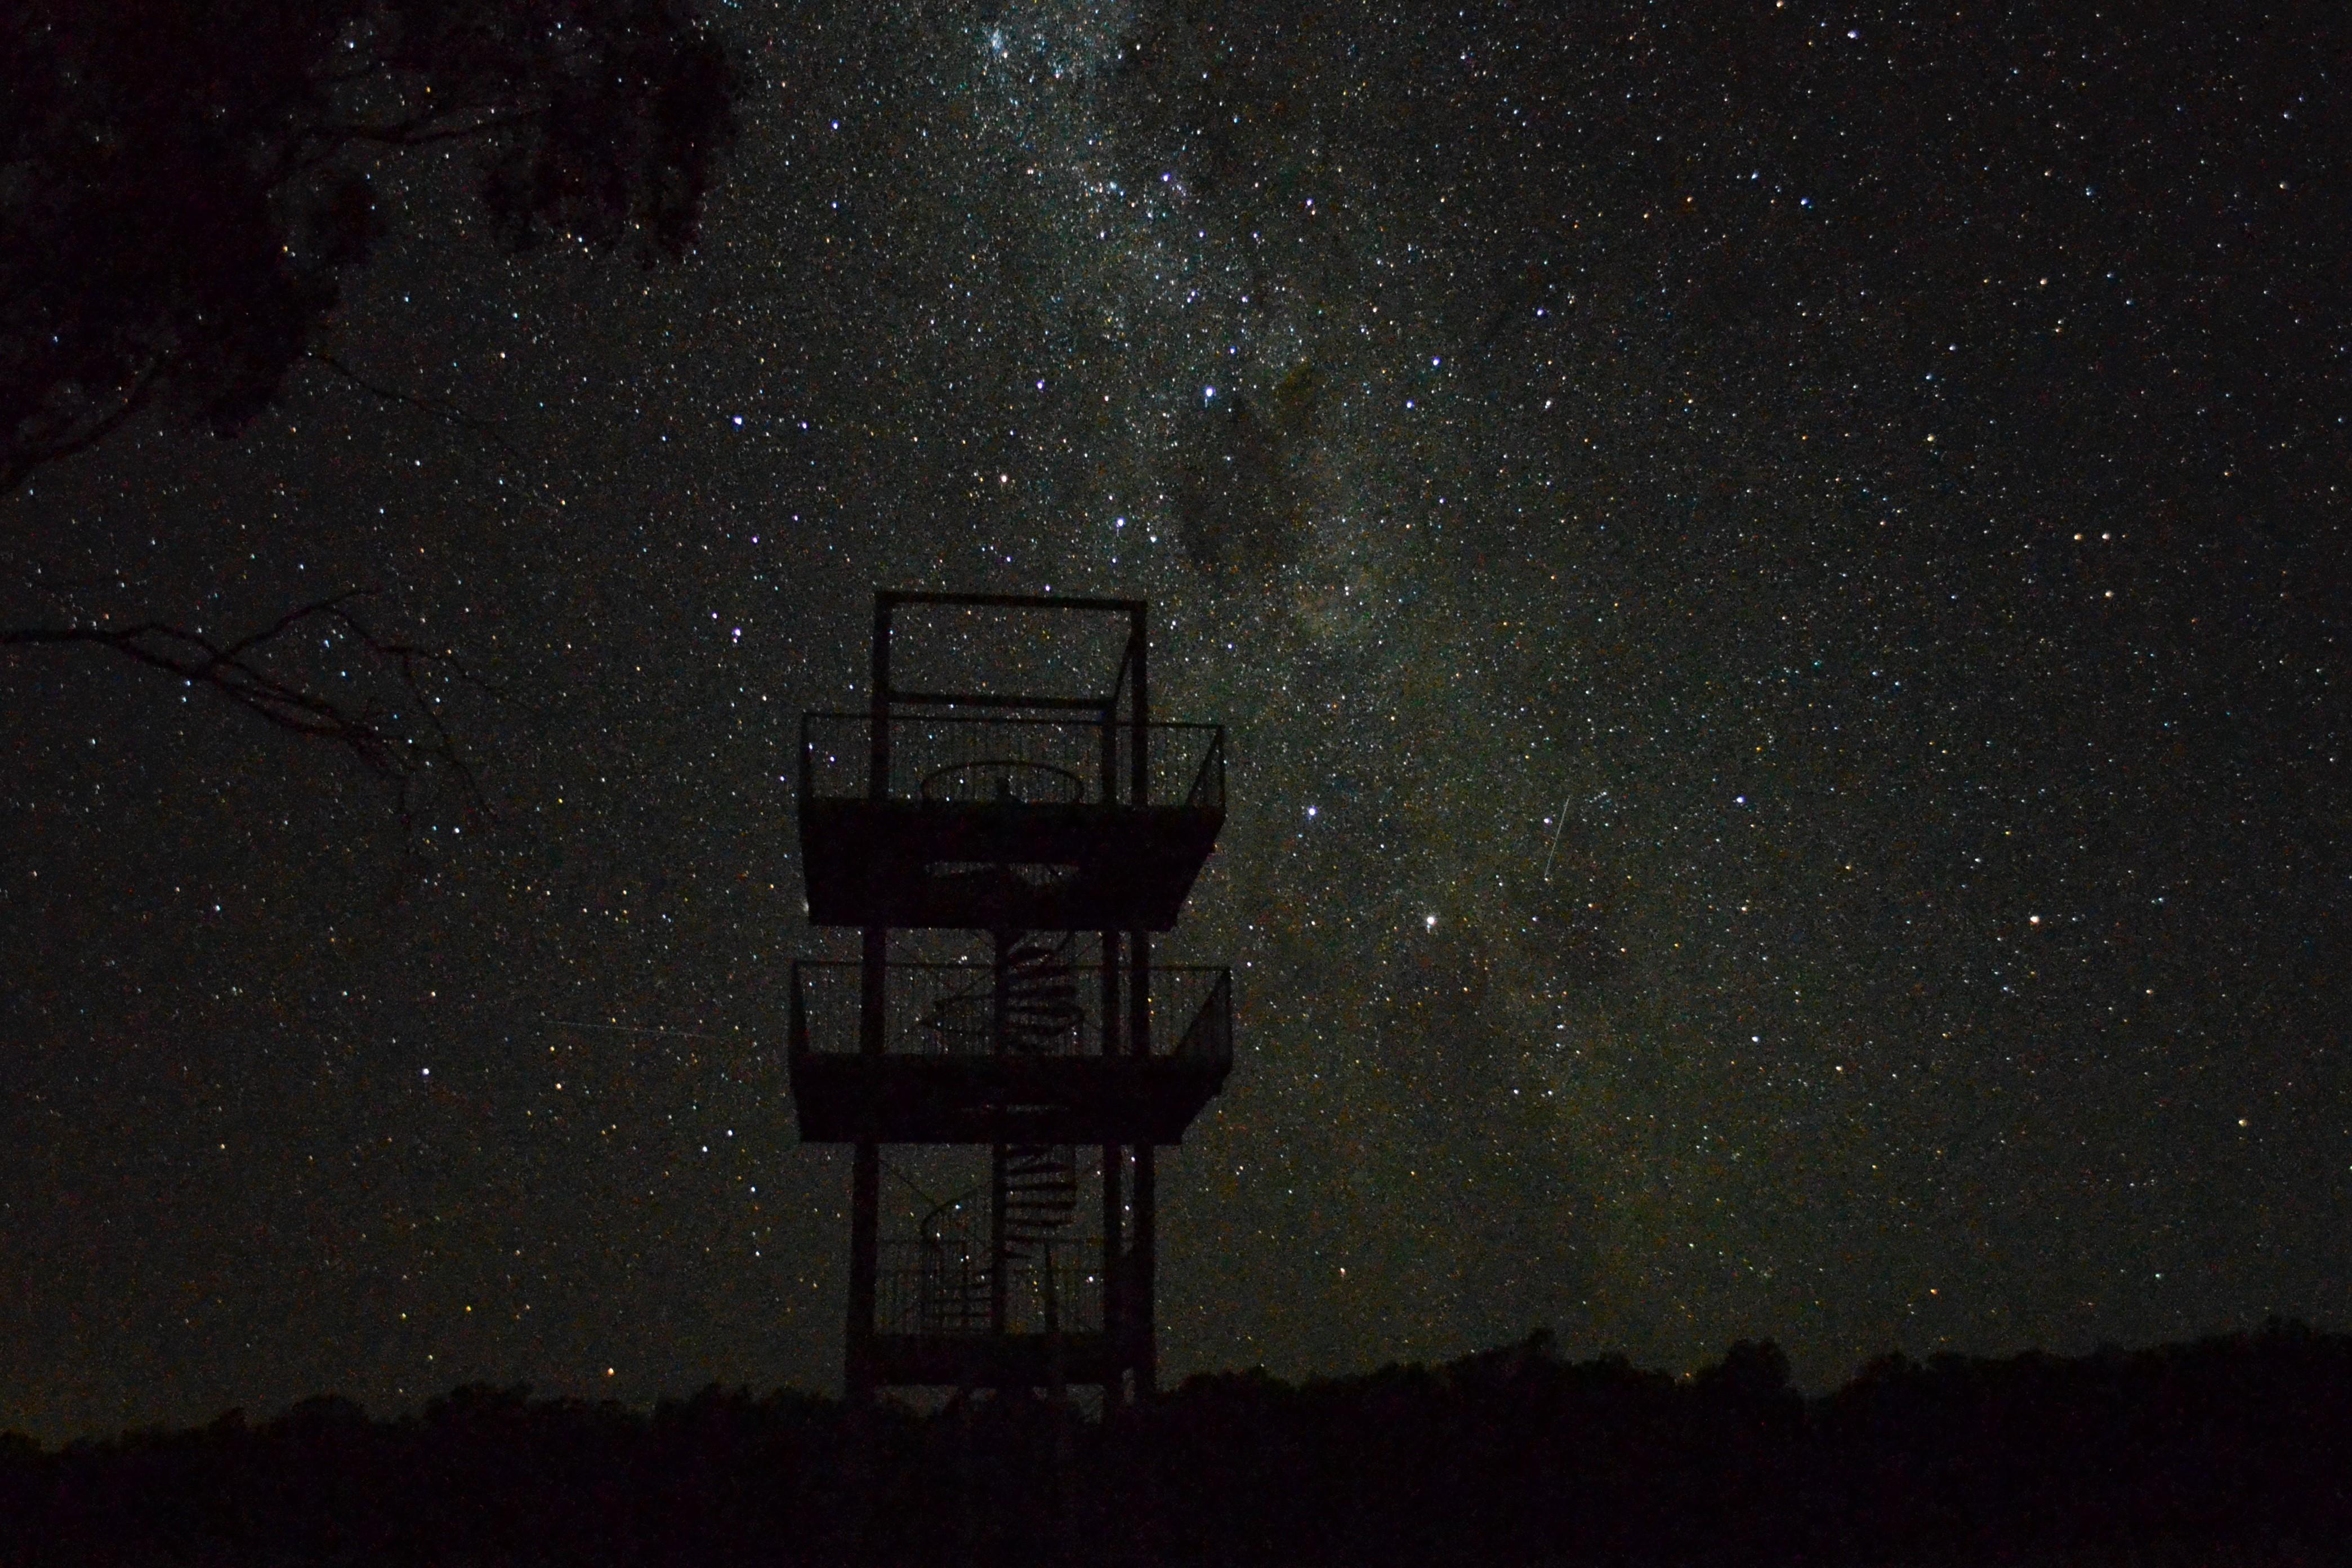 The Night Sky at Yarrabandai Creek Homes